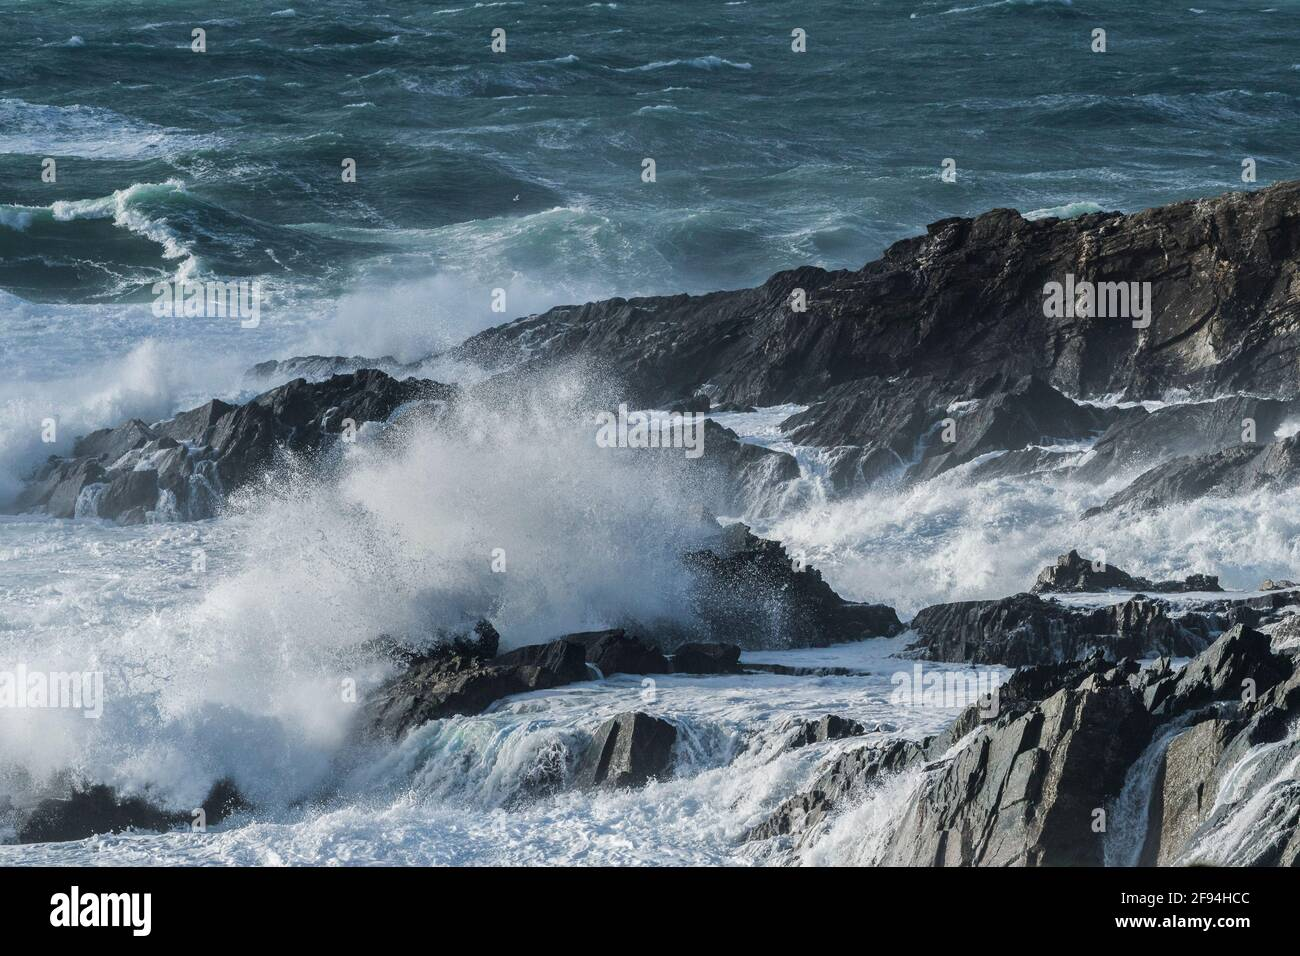 Waves crashing over the Cribbar Rocks on the coast of Towan Head in Newquay in Cornwall. Stock Photo